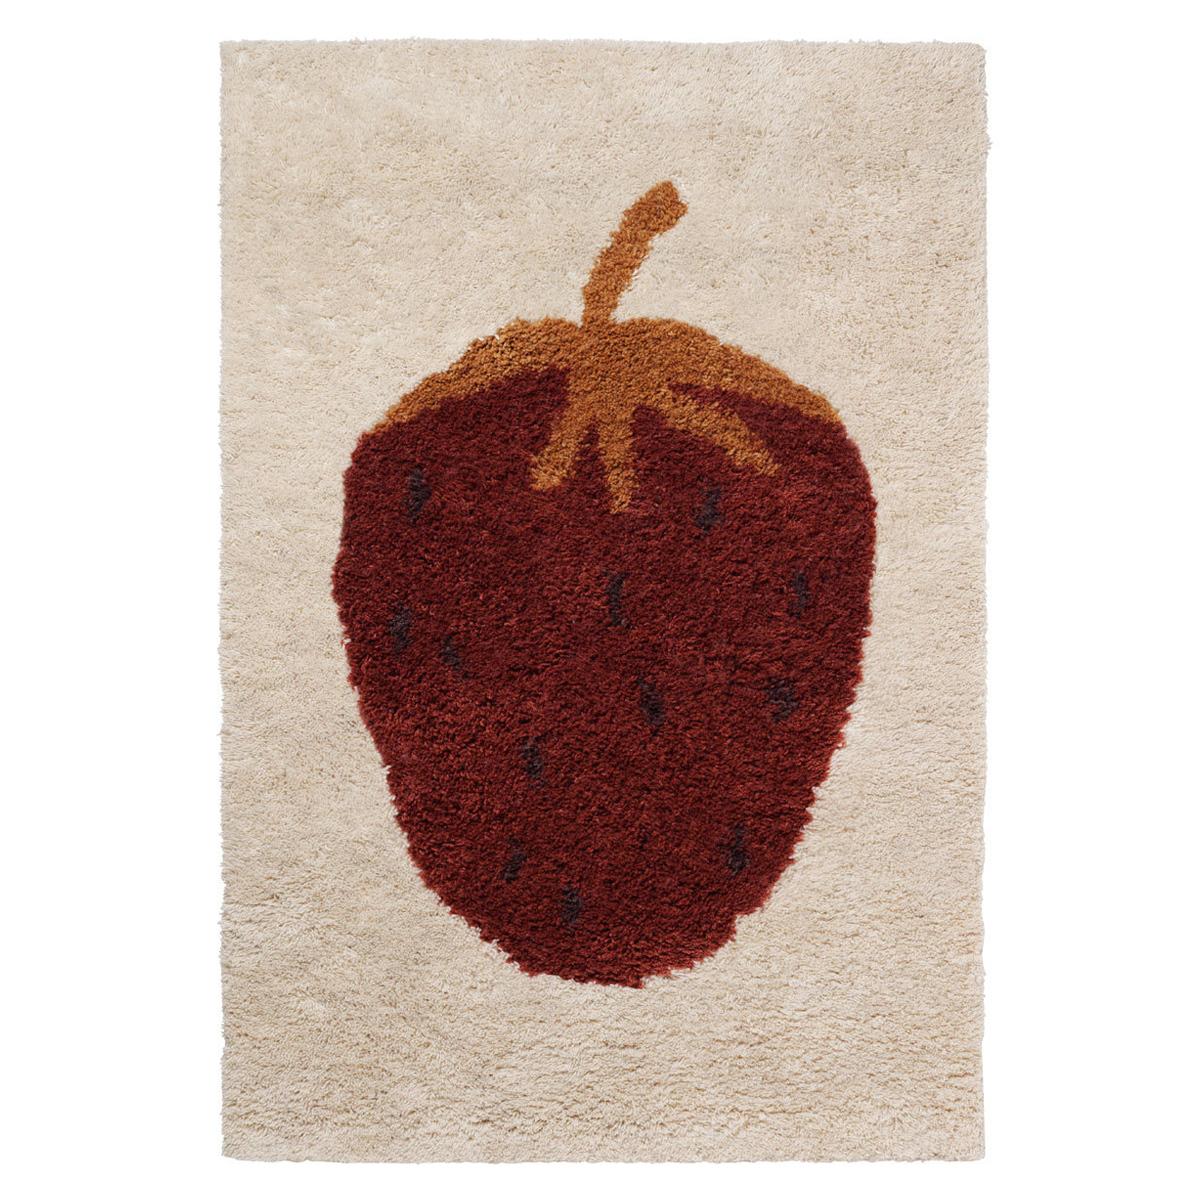 Tapis Tapis Fruiticana Fraise - 80 x 120 cm Tapis Fruiticana Fraise - 80 x 120 cm